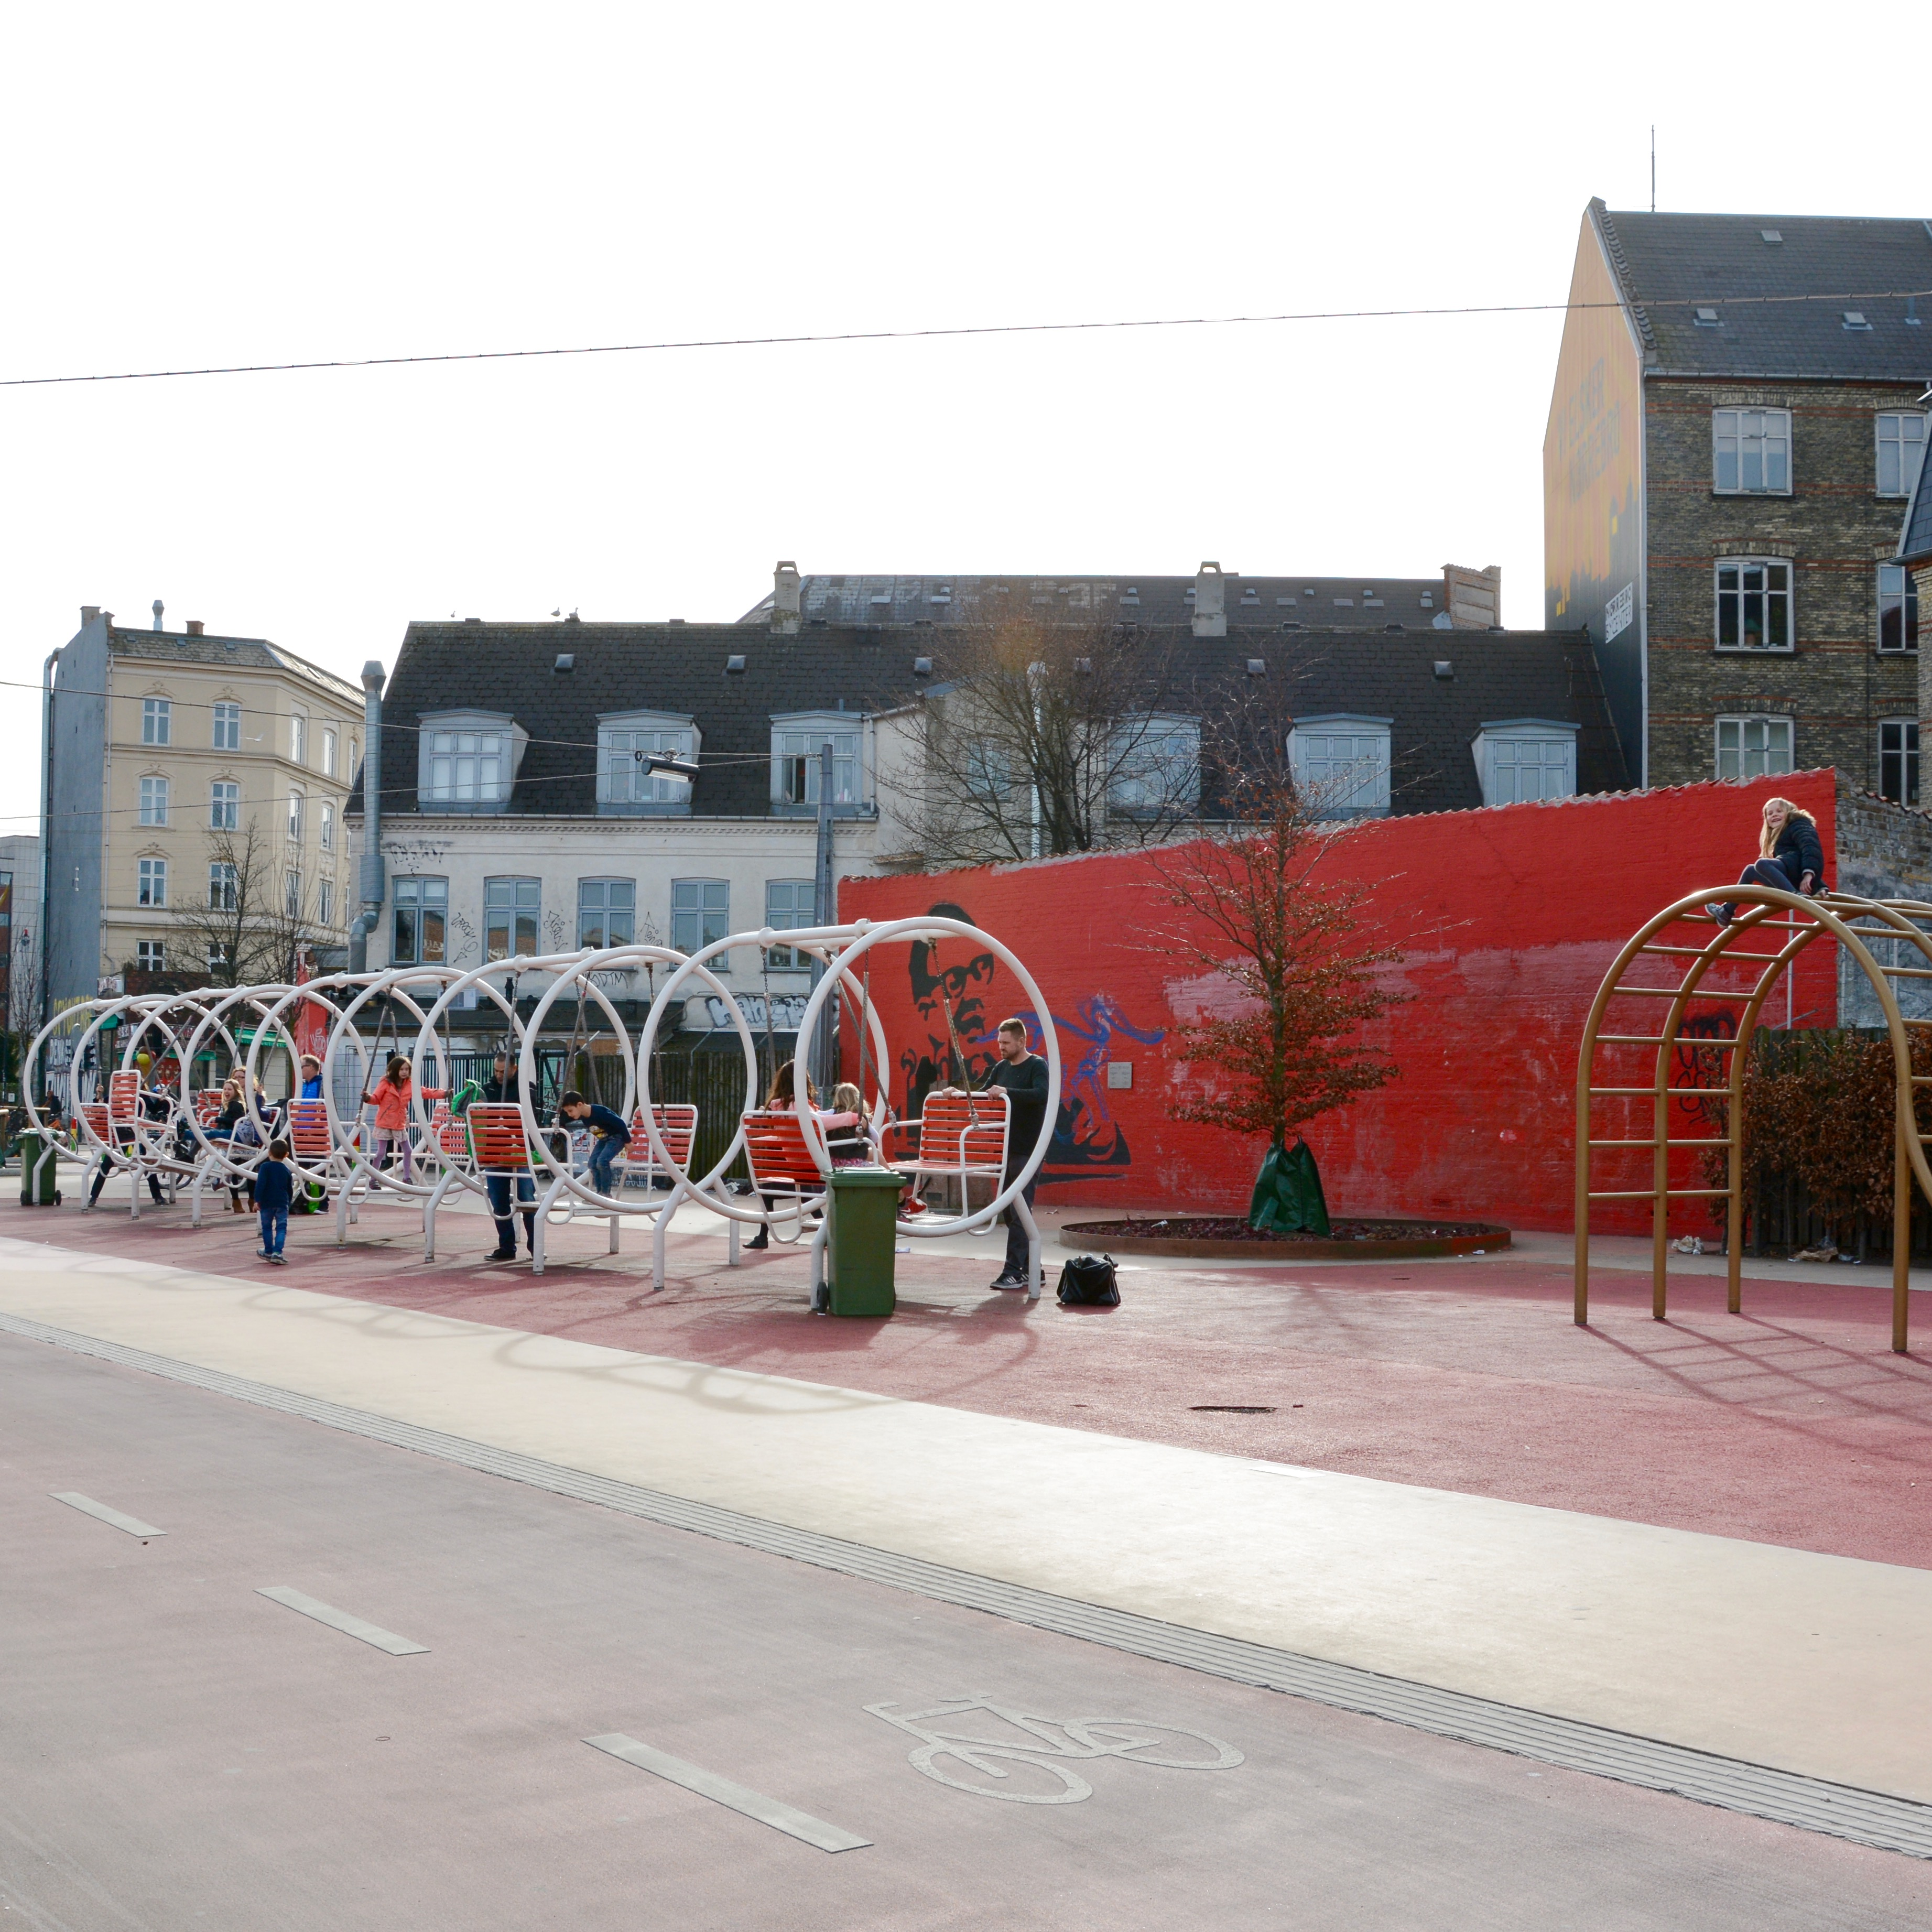 travel with kids children Copenhagen Denmark norrebro superkilen park swings